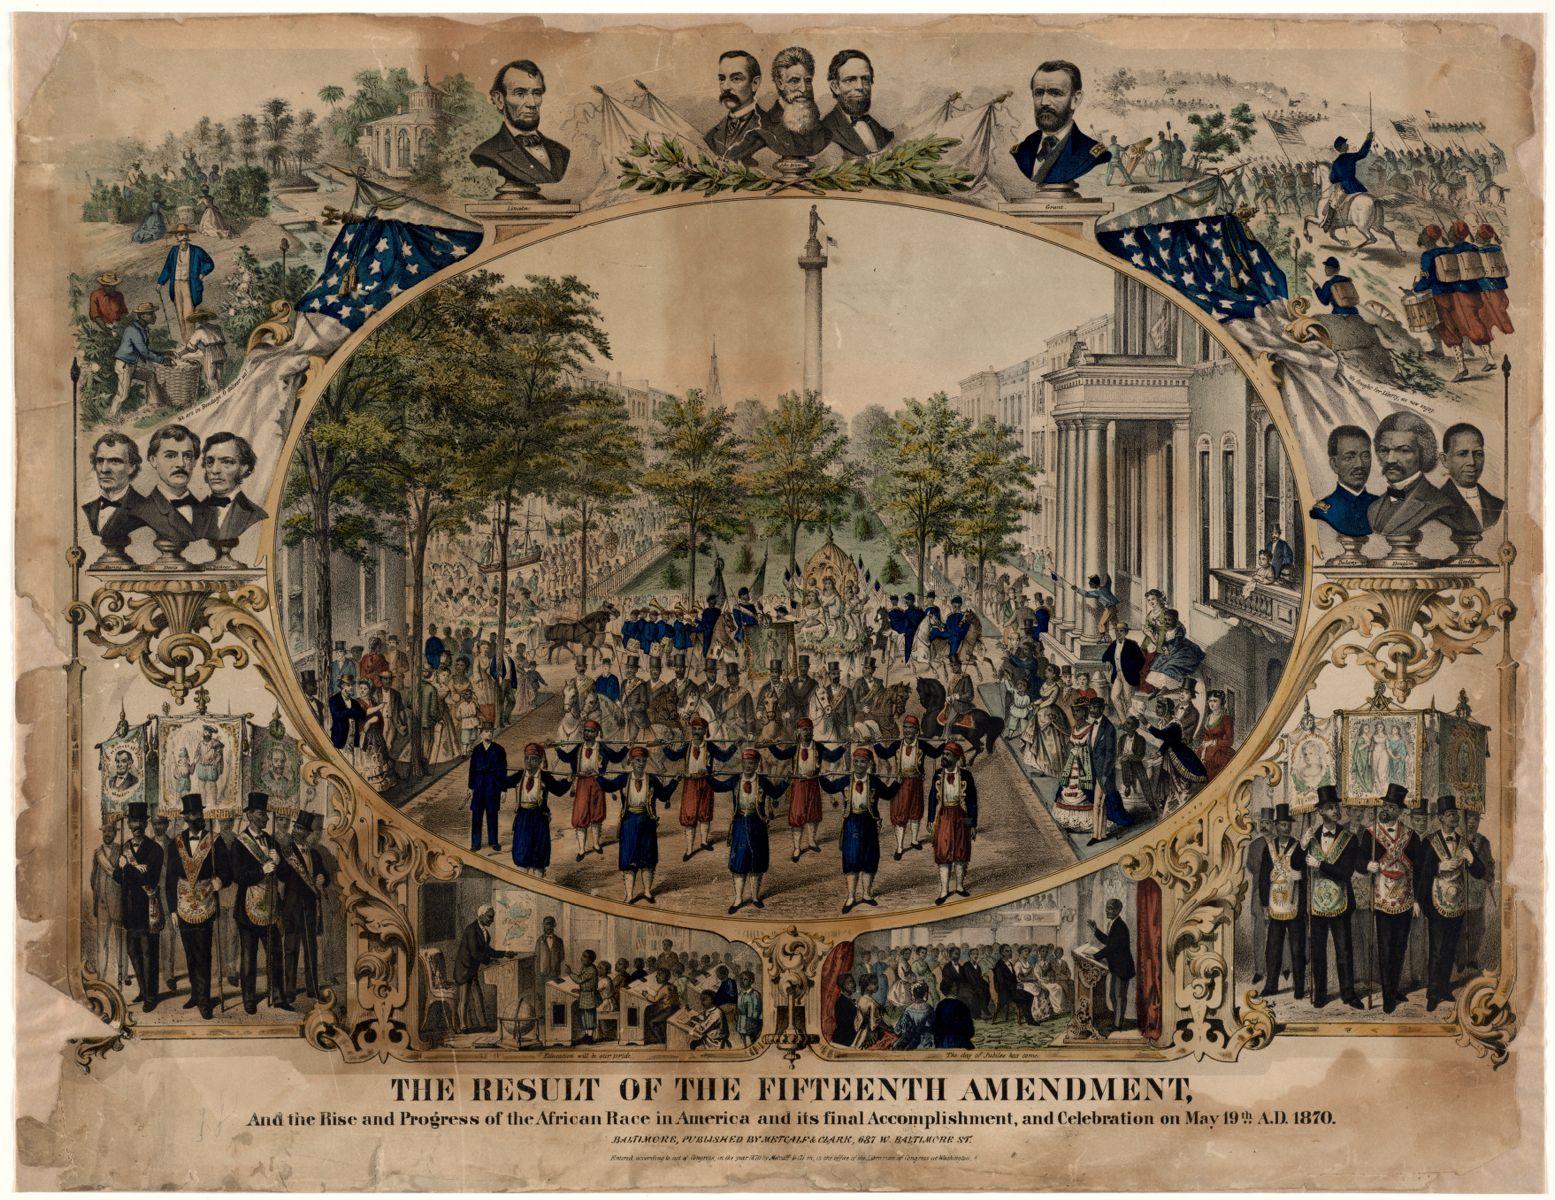 Metcalf & Clark, The result of the Fifteenth Amendment… (1870)